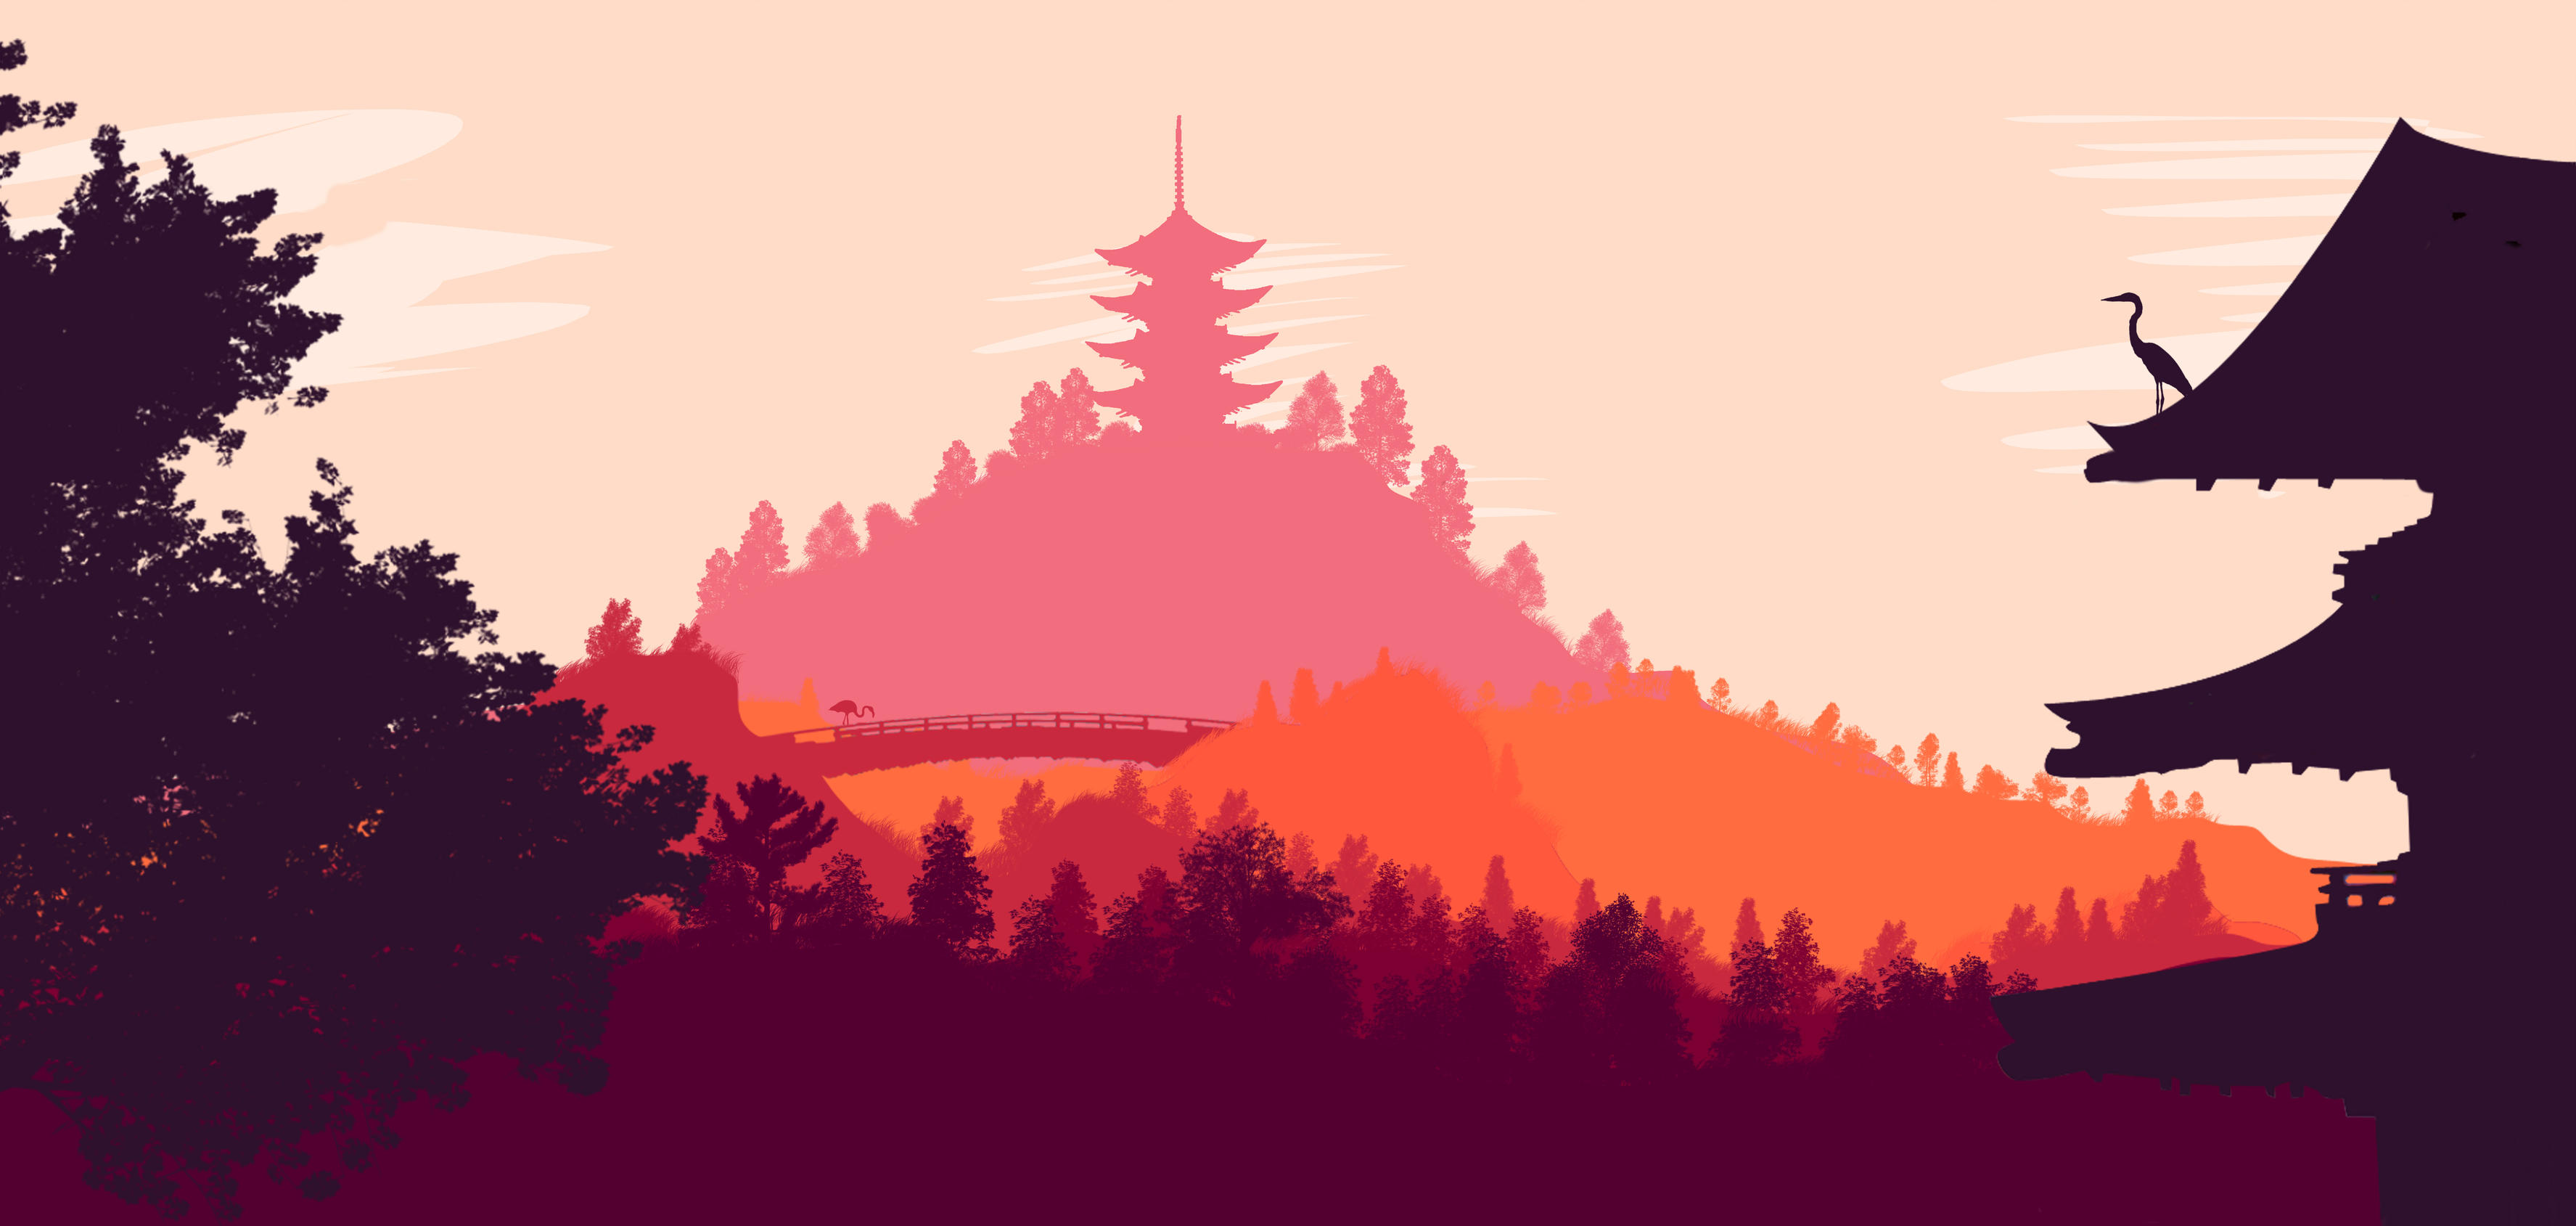 Japanese Landscape by Finnfanfoodle